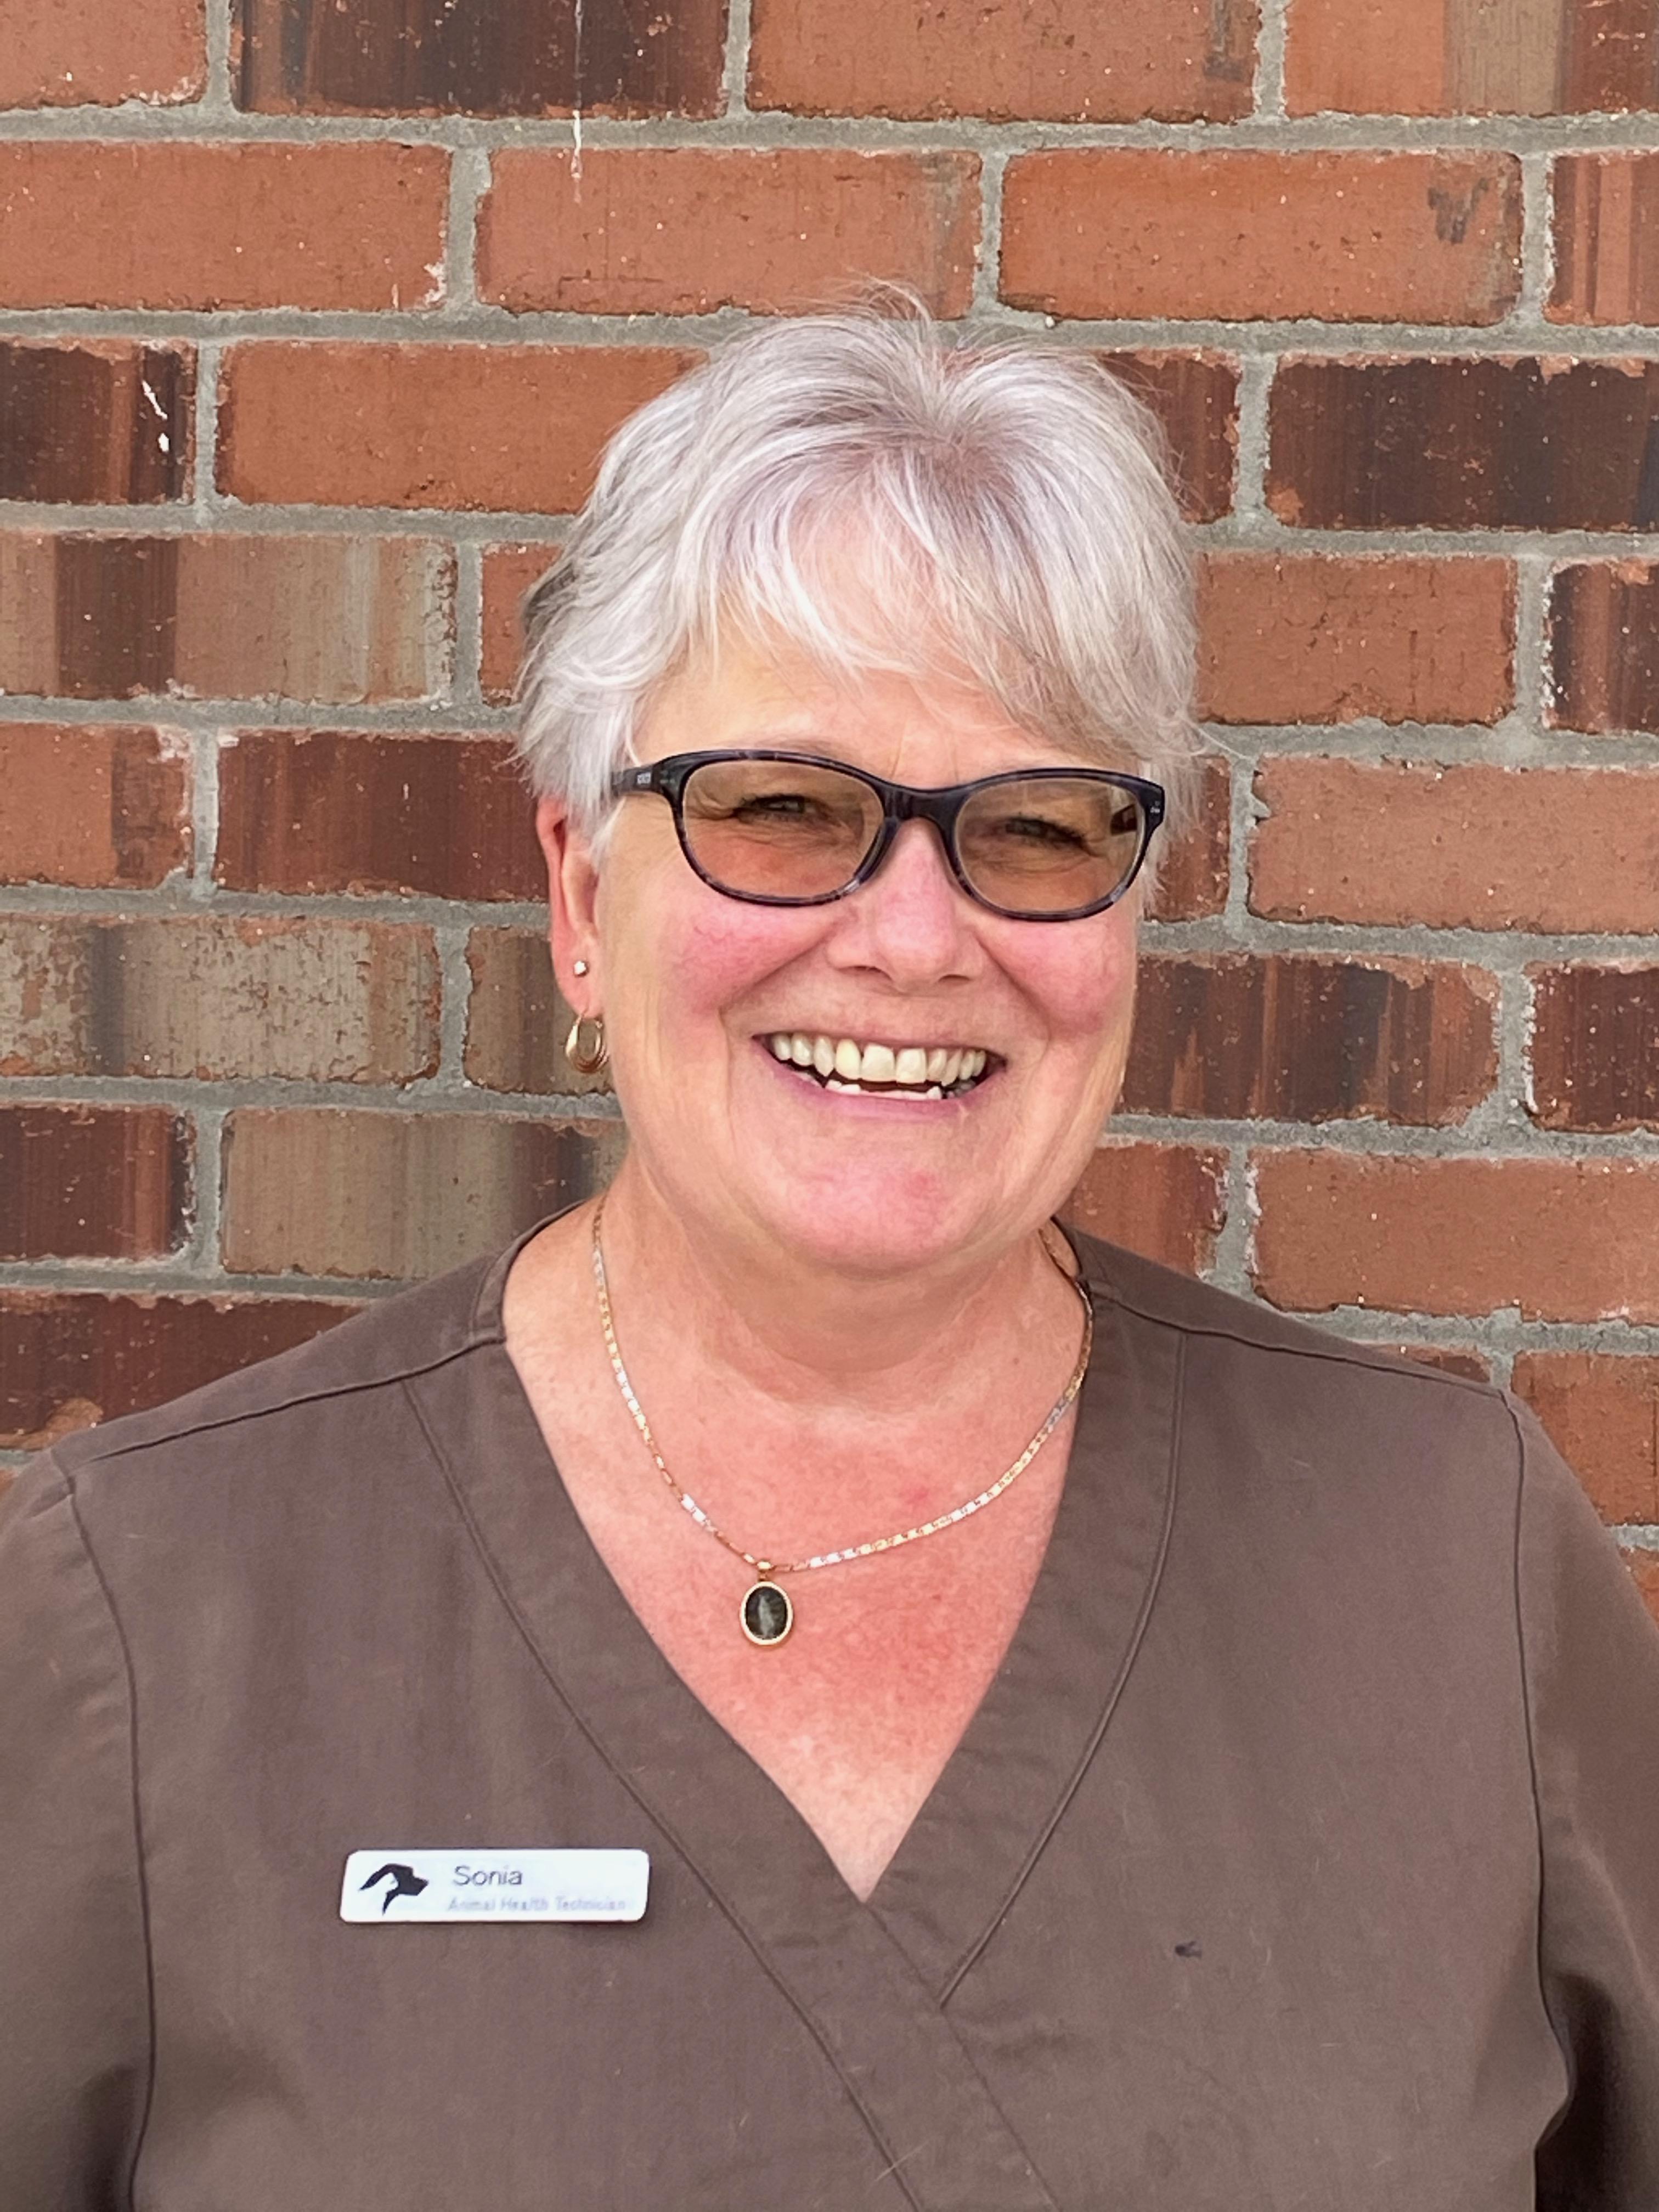 Sonia - Registered Veterinary Technician